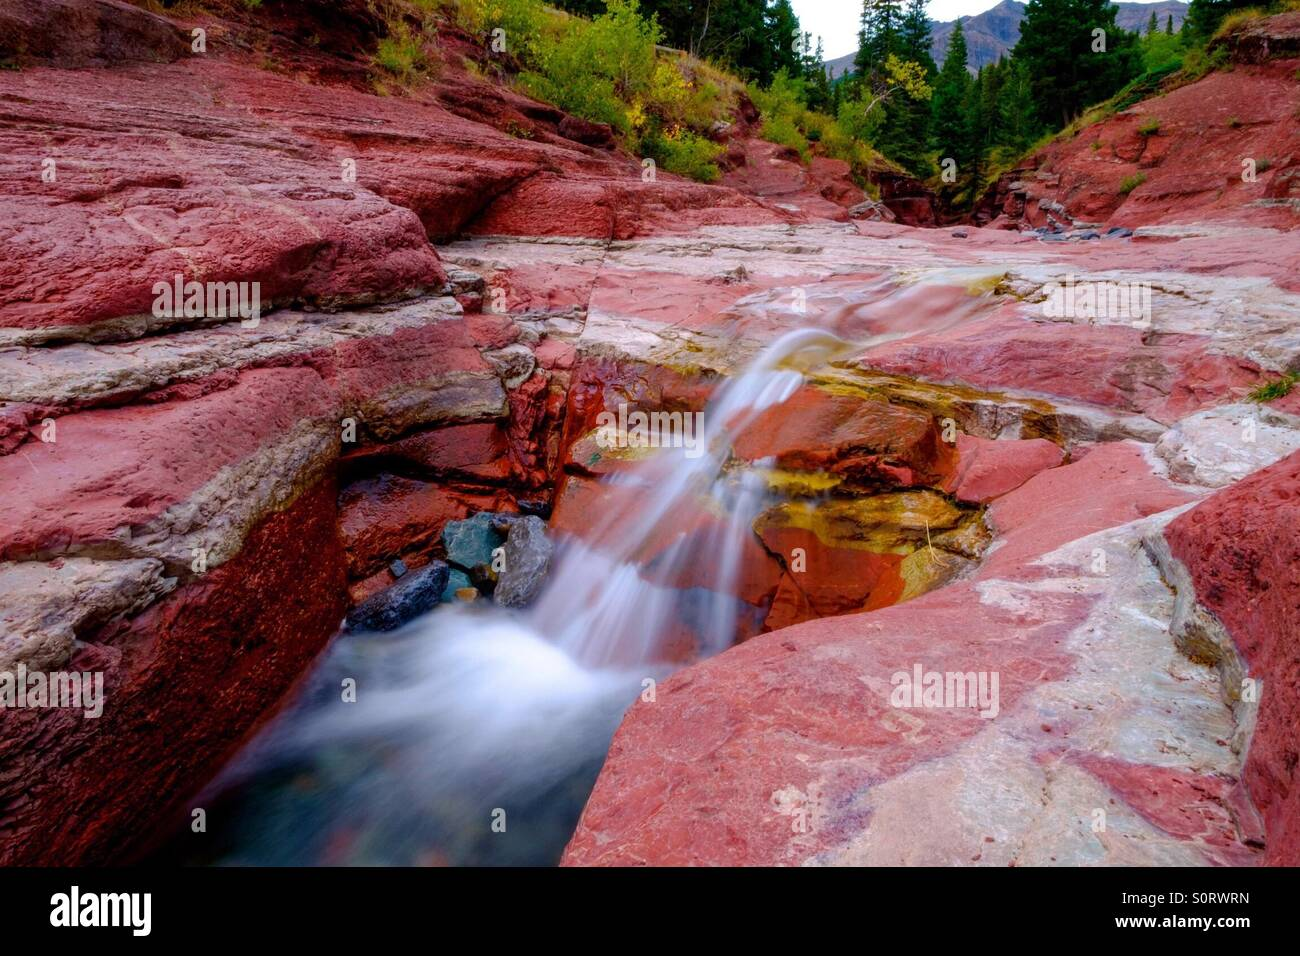 Redrock - Stock Image